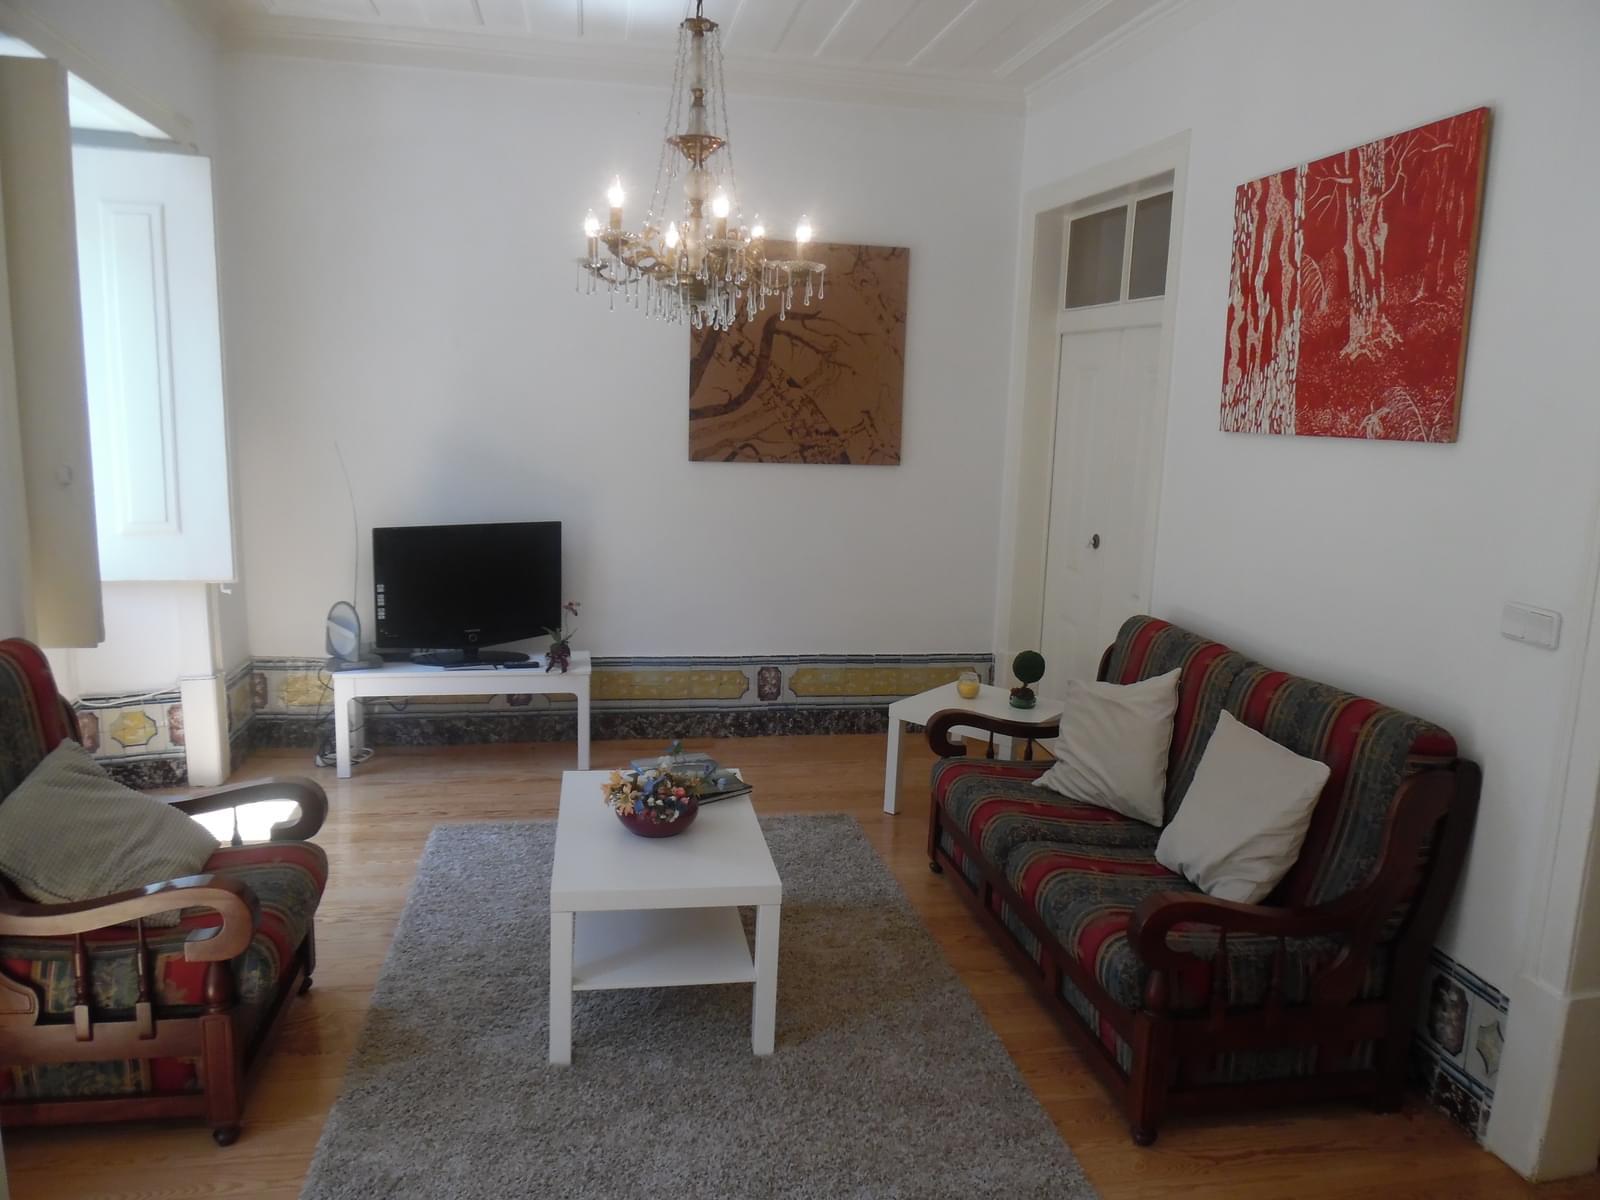 pf17147-apartamento-t2-lisboa-e260c2ff-dd41-42fa-b211-0421b57883f1